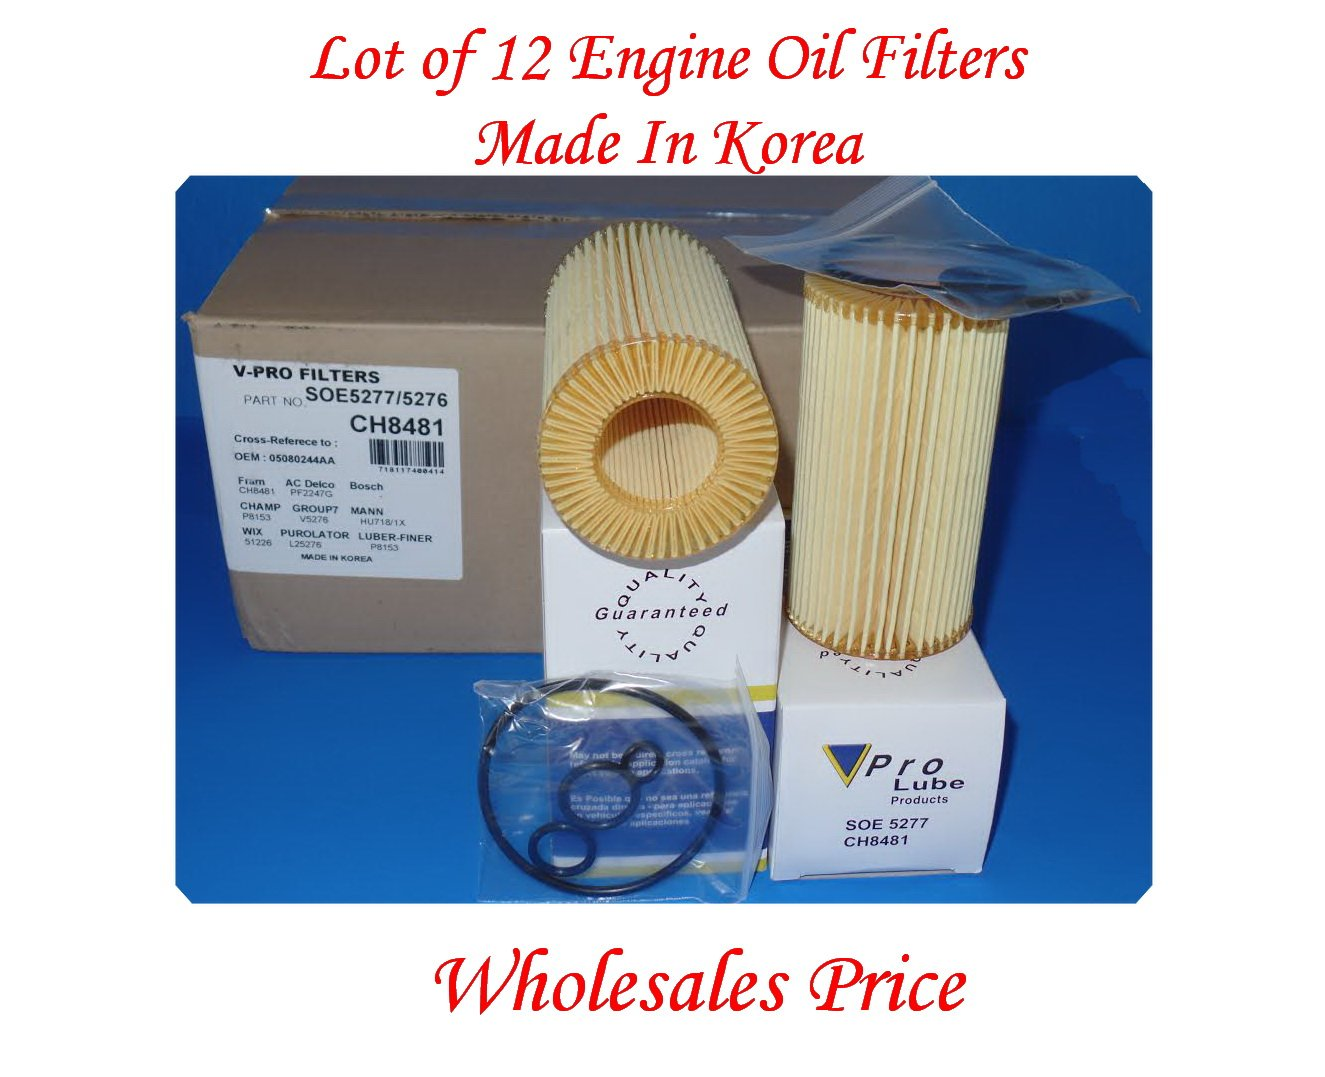 Lot of 12) Engine Oil Filter Made In Korea SOE5277 Cross